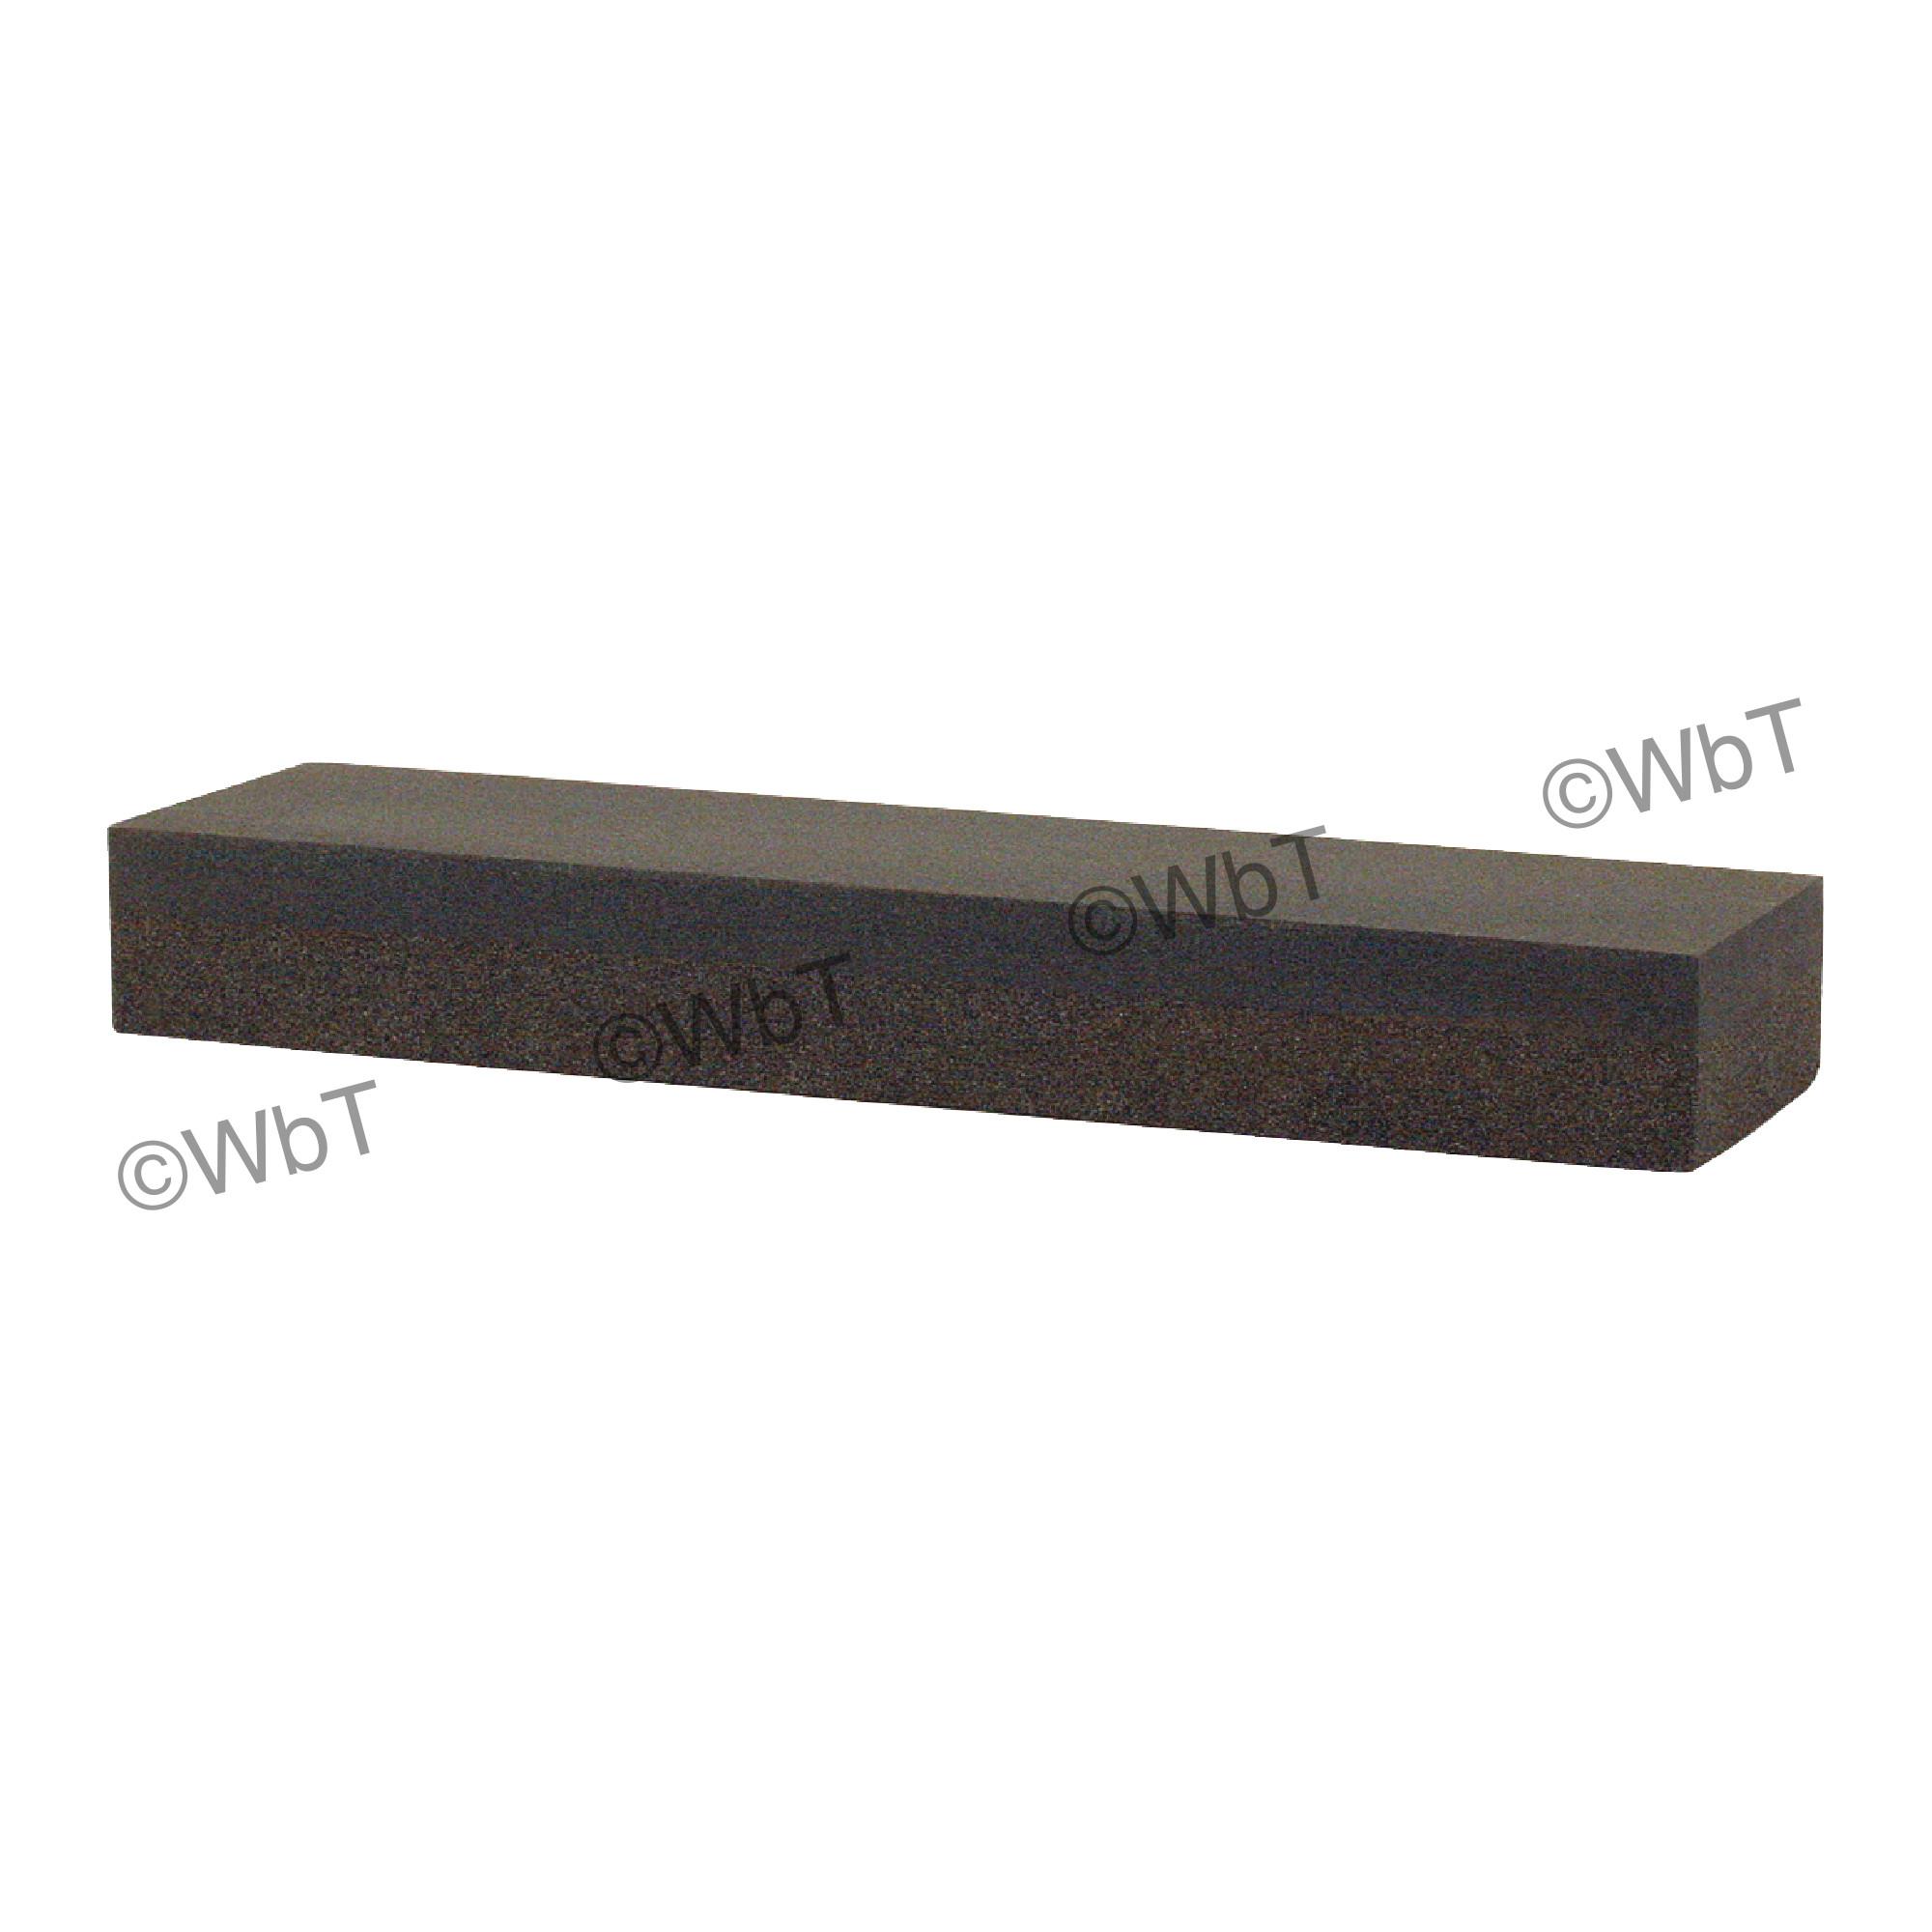 "Combination Bench Sharpening Stone 1"" x 2"" x 6"" - Silicon Carbide"